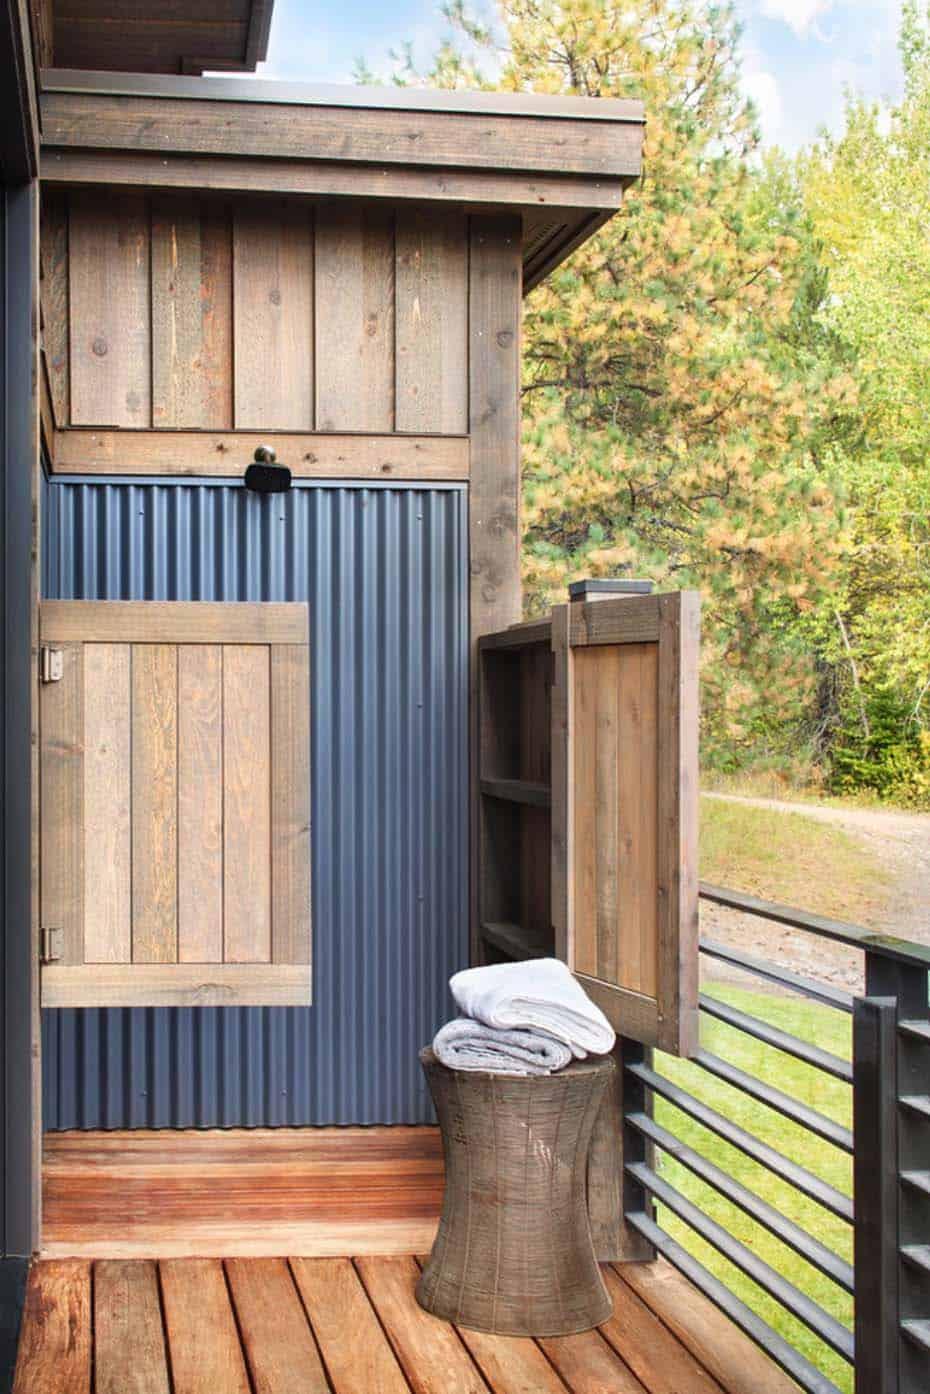 Rustic-Modern Dwelling-Sage Interior Design-16-1 Kindesign